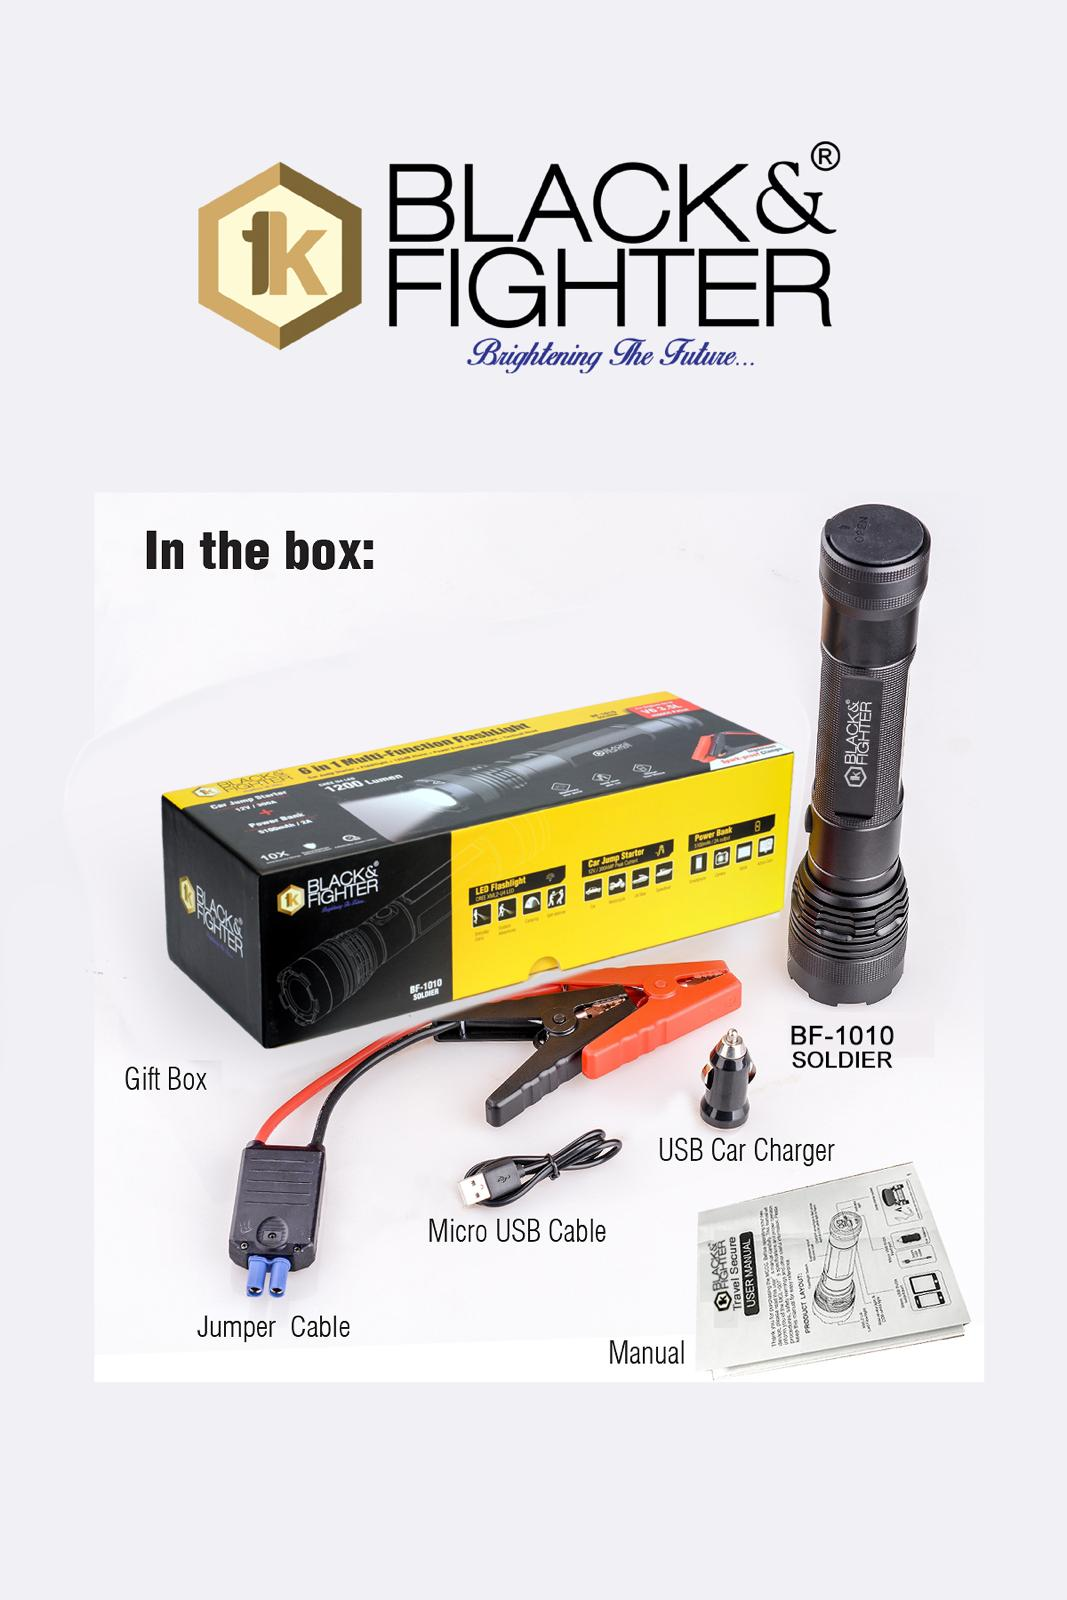 BLACK & FIGHTER 6 IN 1 MULTI-FUNCTION FLASHLIGHT